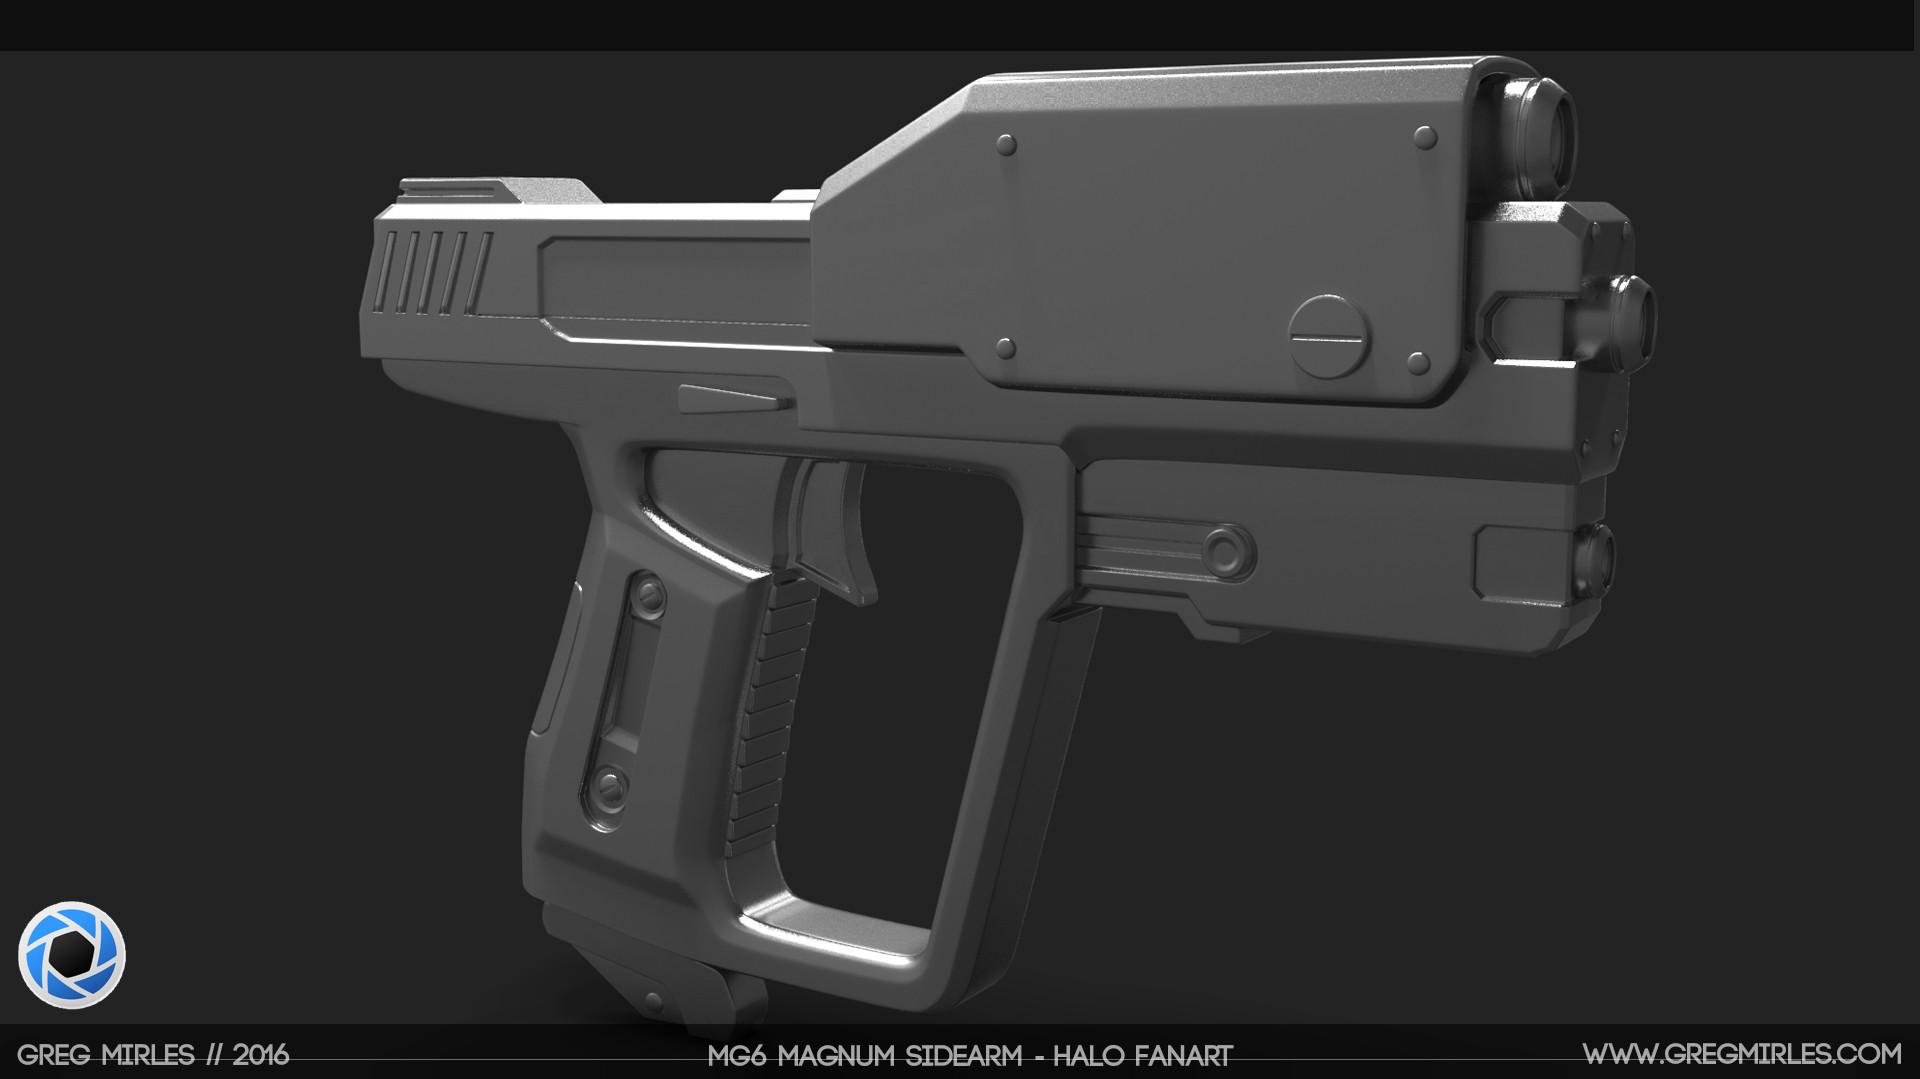 Greg mirles gun 02